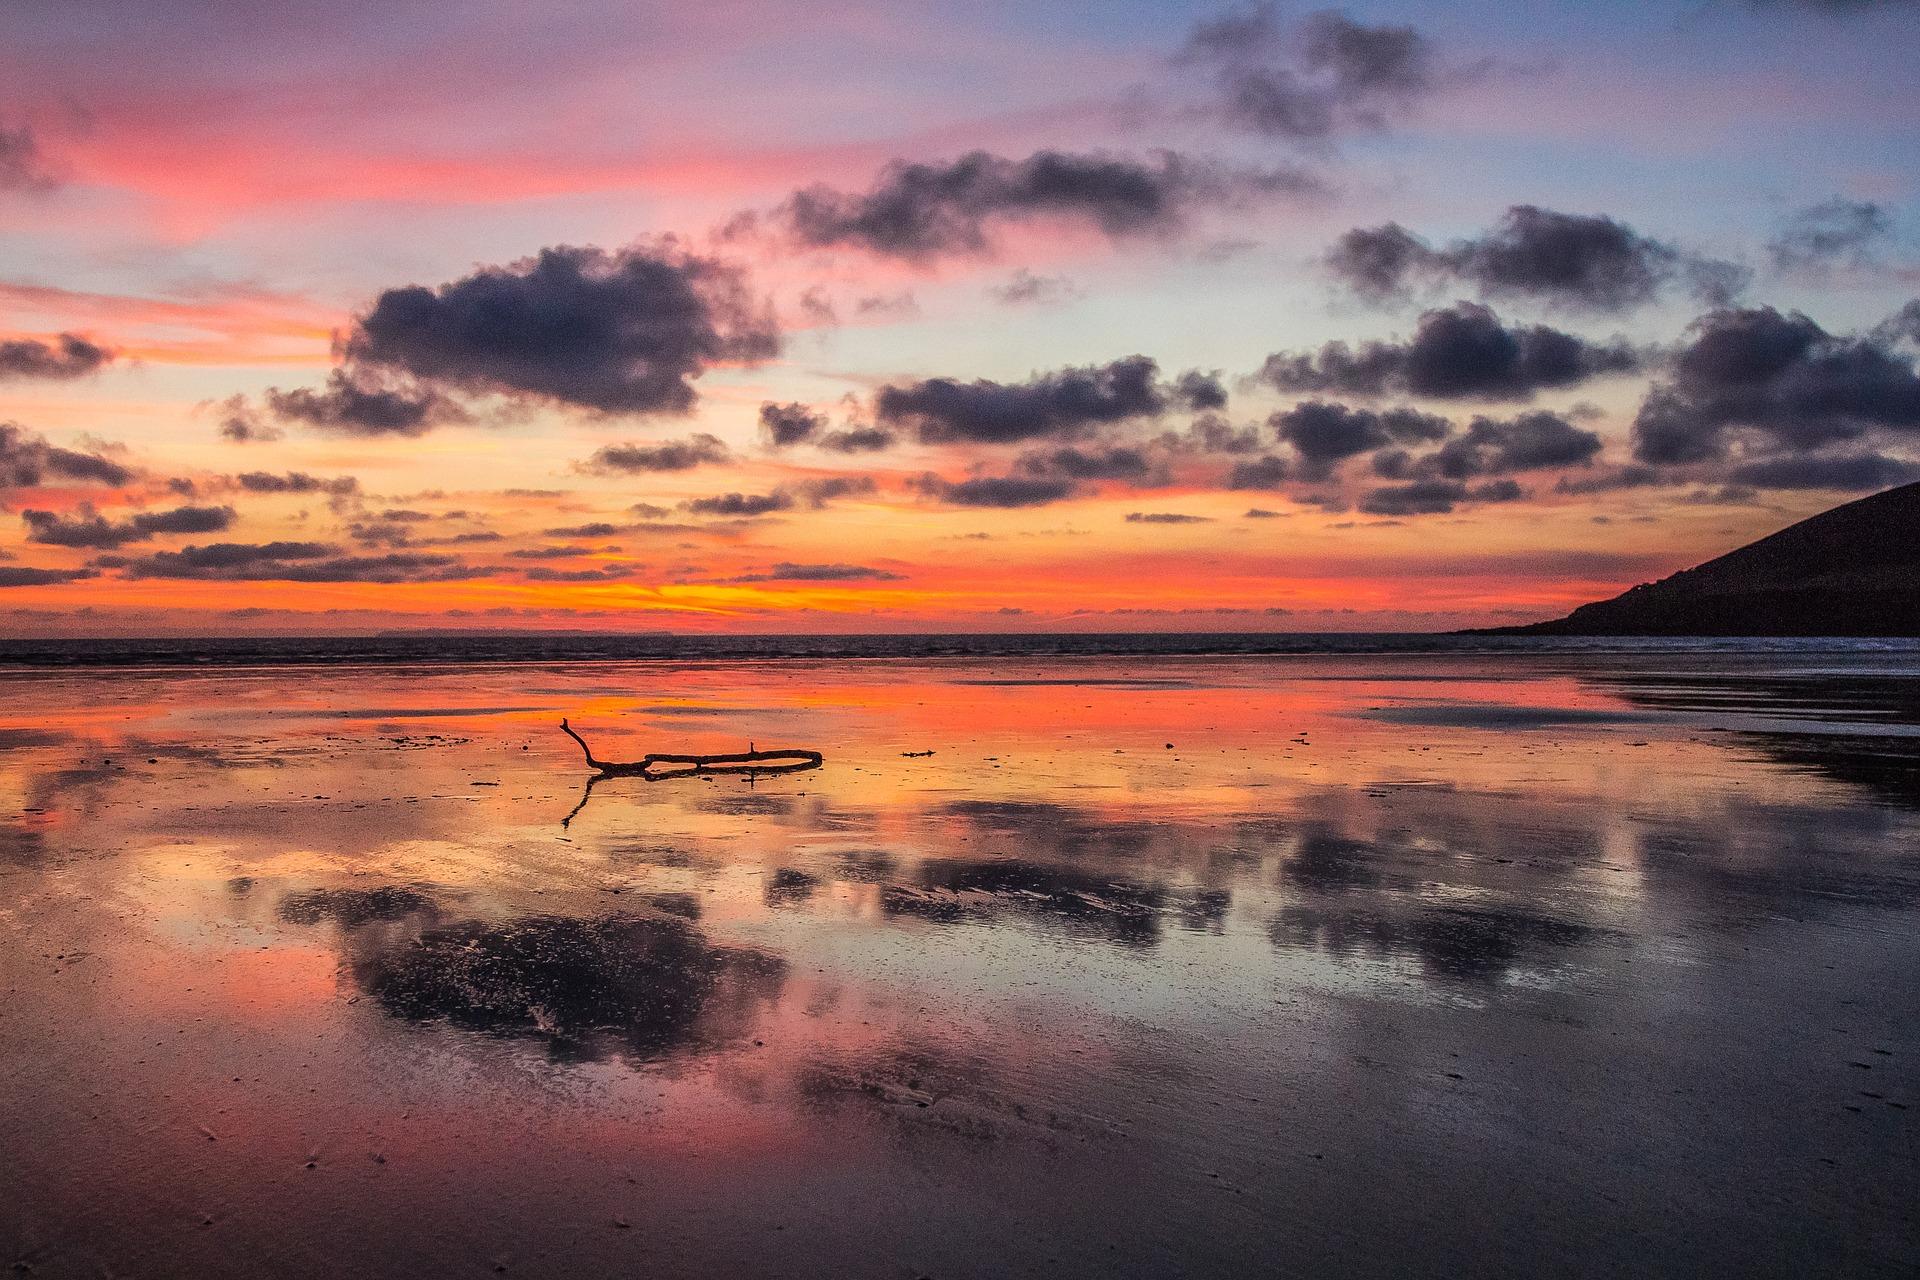 sunset-1746169_1920